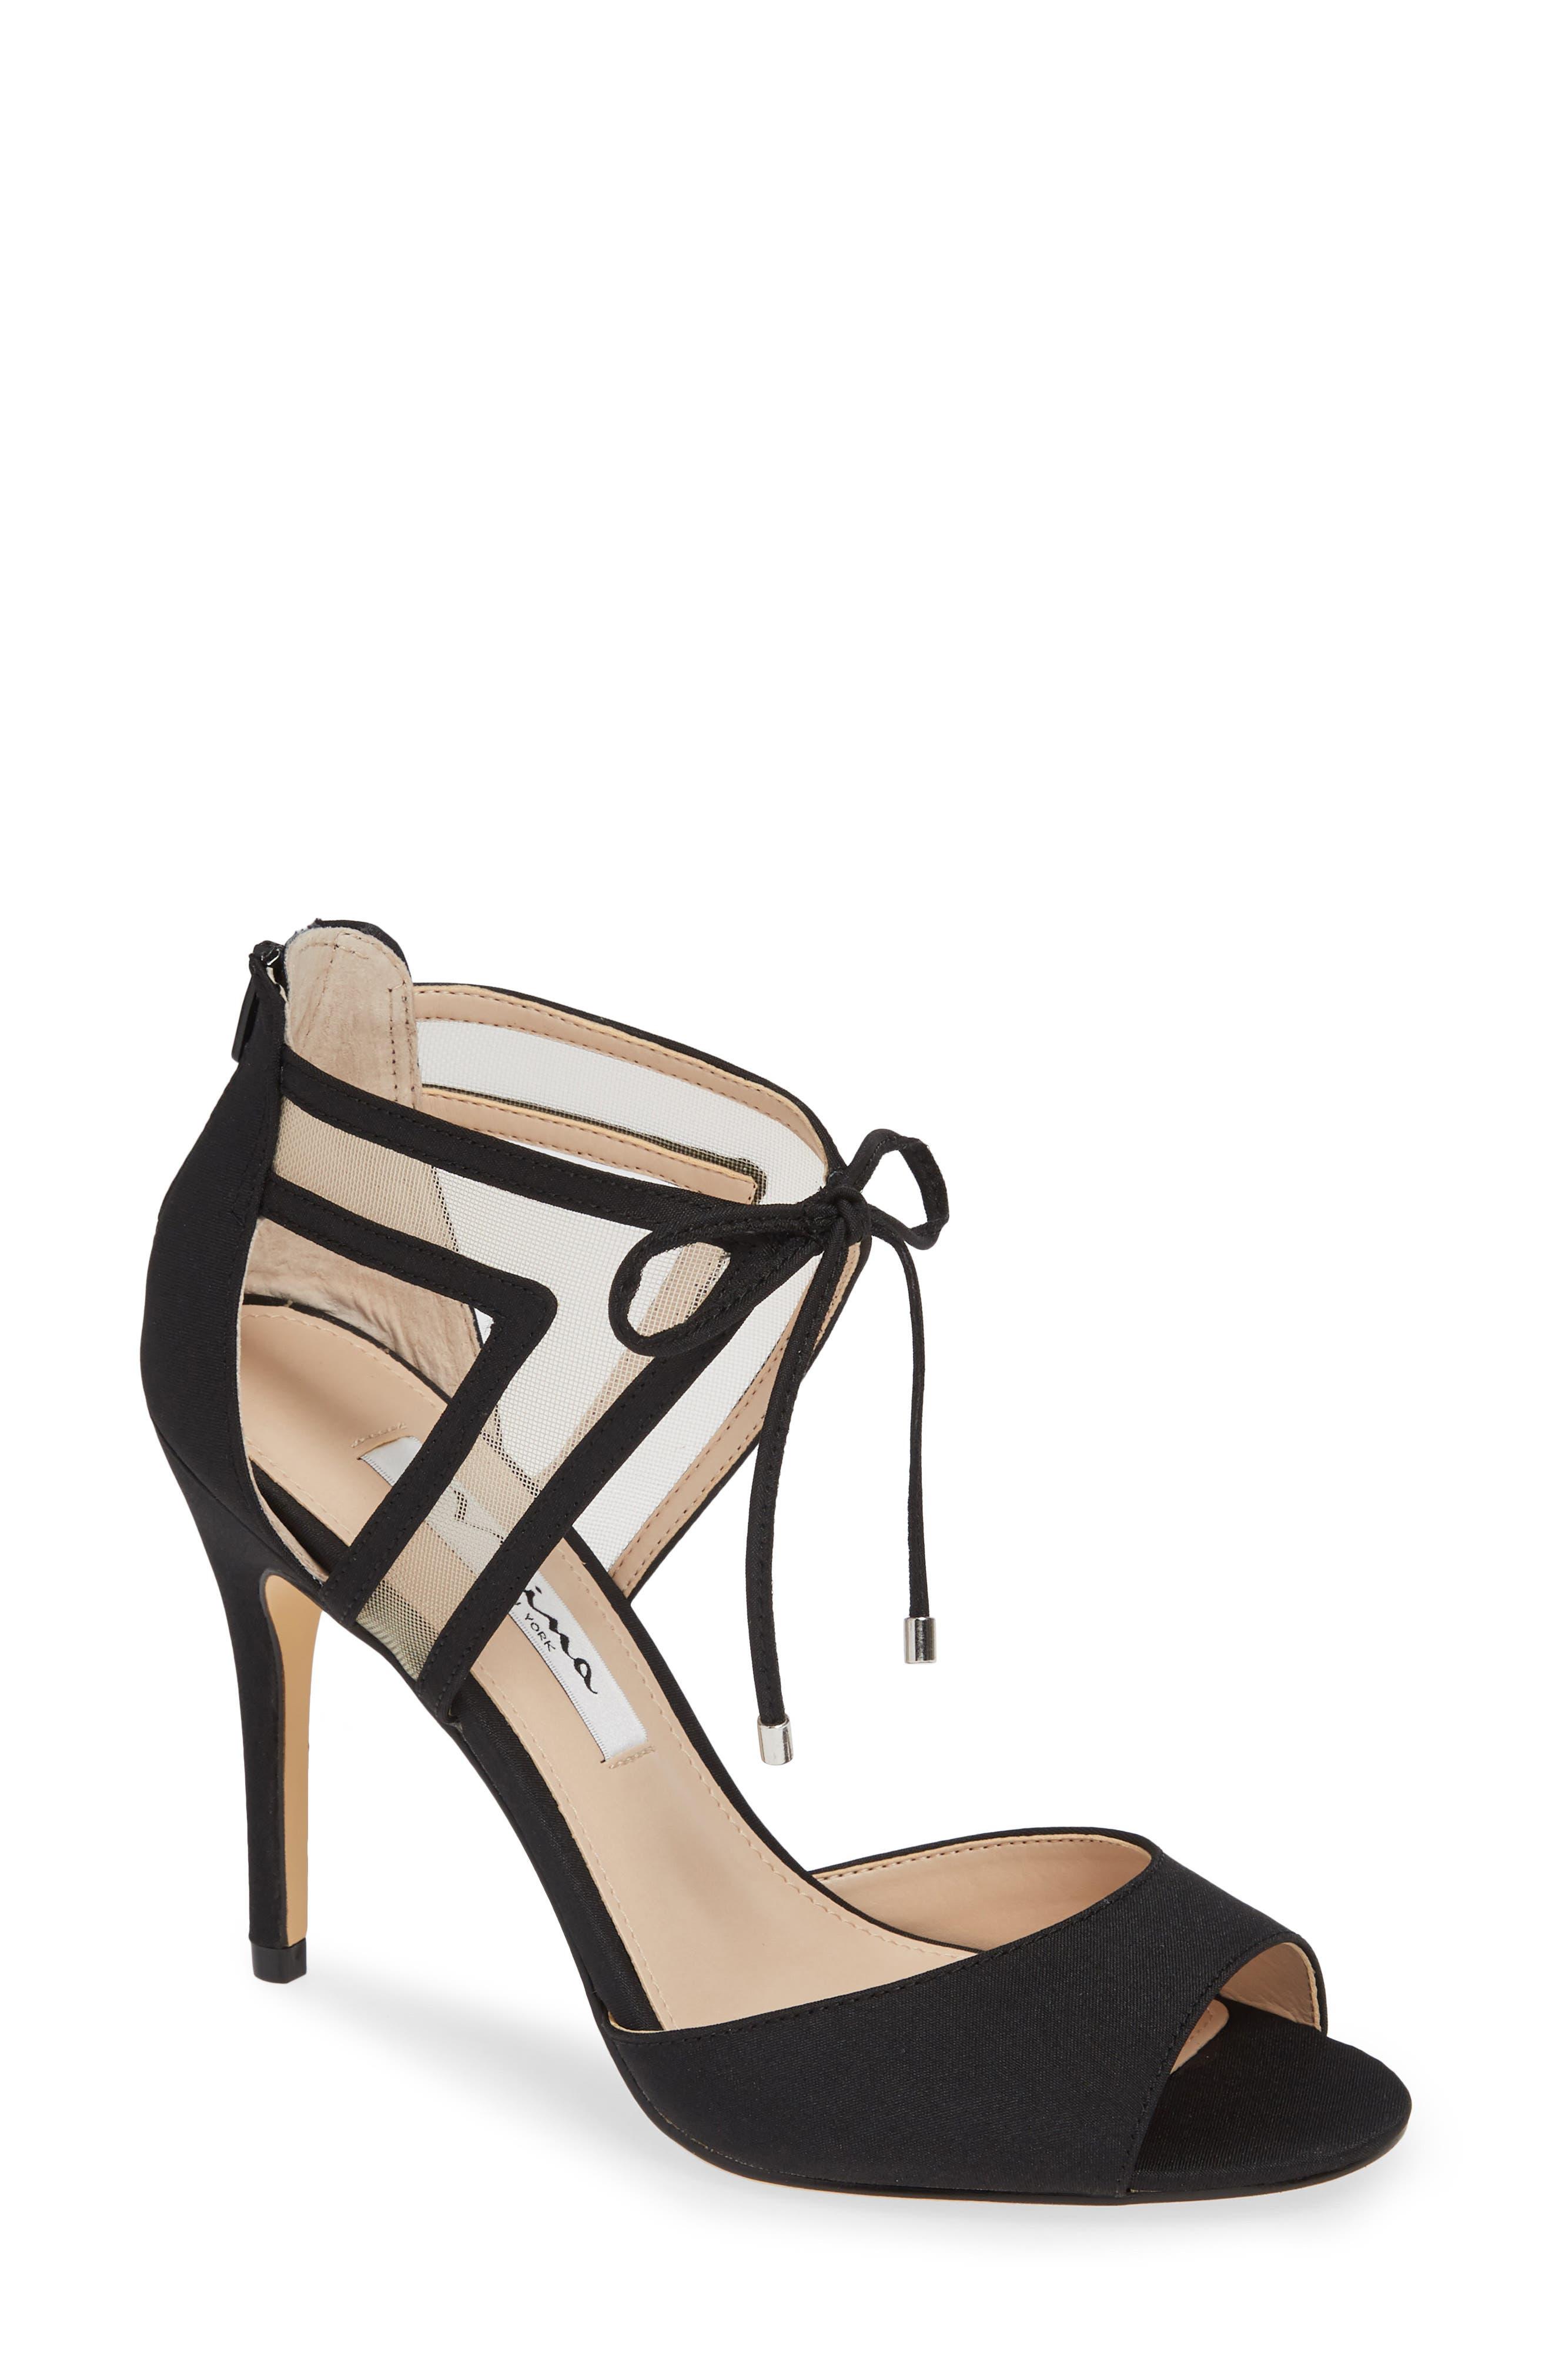 NINA, Caleya Ankle Tie Sandal, Main thumbnail 1, color, BLACK CHAMPAGNE